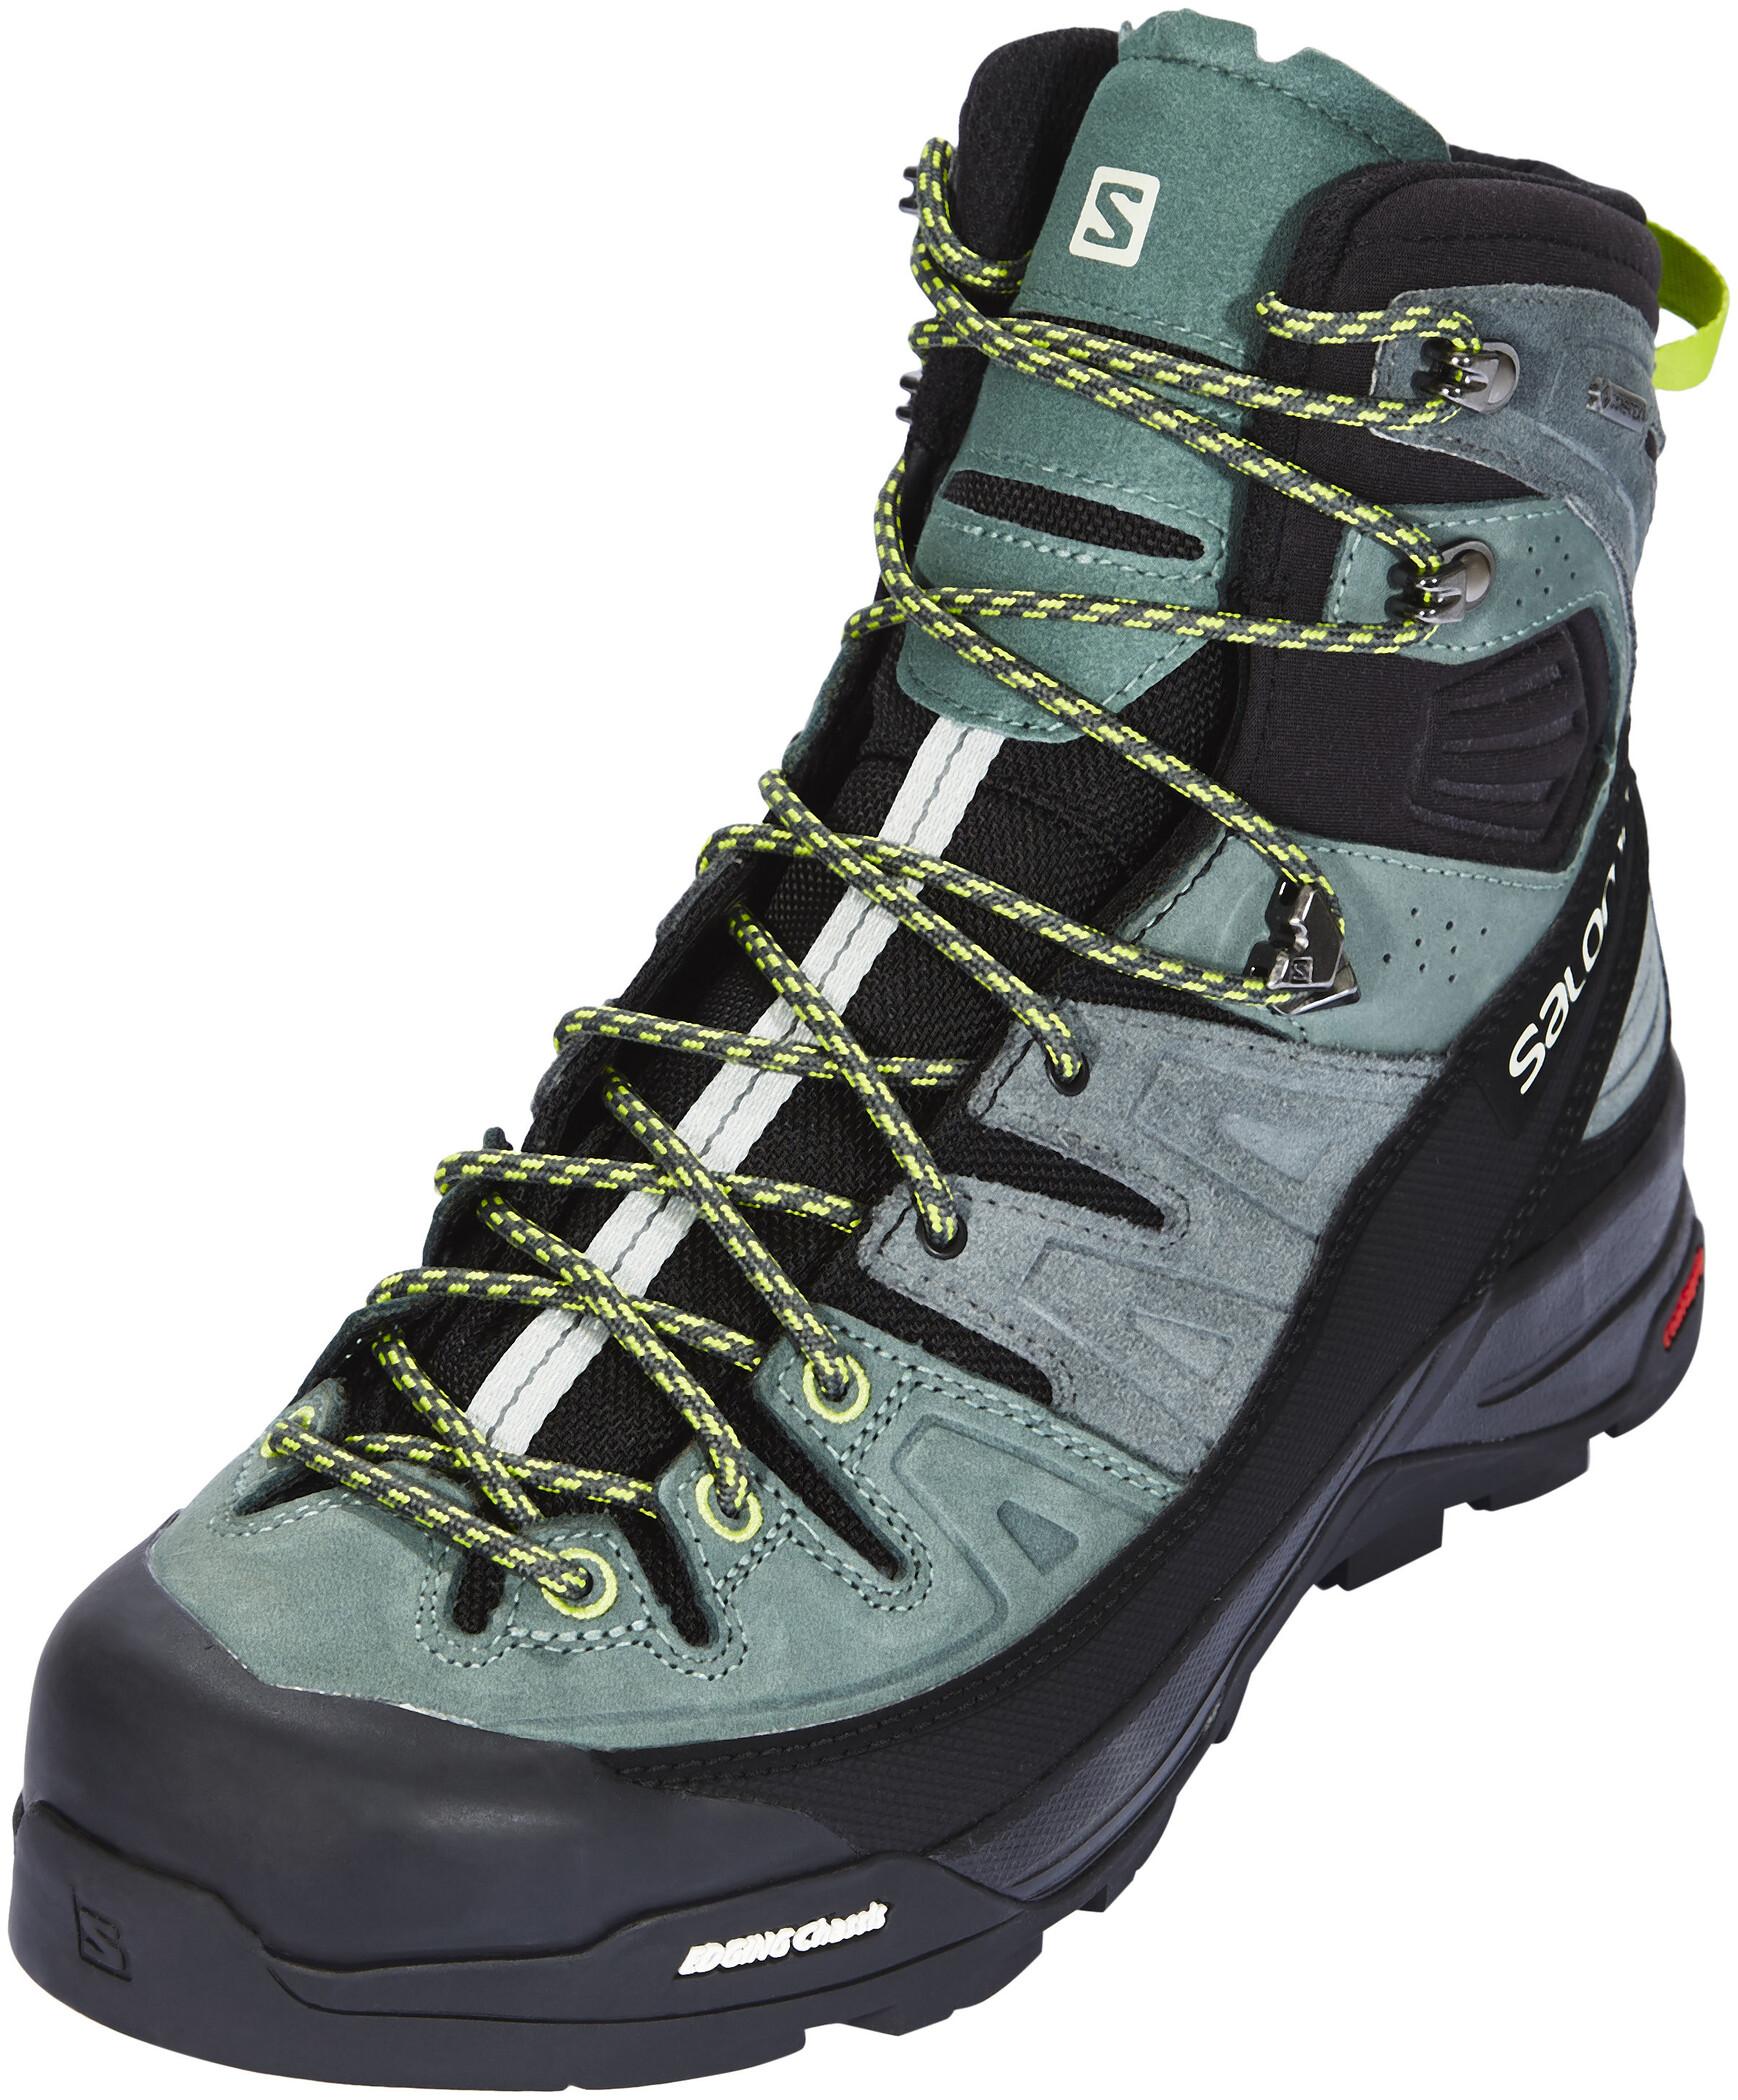 Salomon X Alp High LTR GTX Shoes Herr urban chicbalsam greenlime green